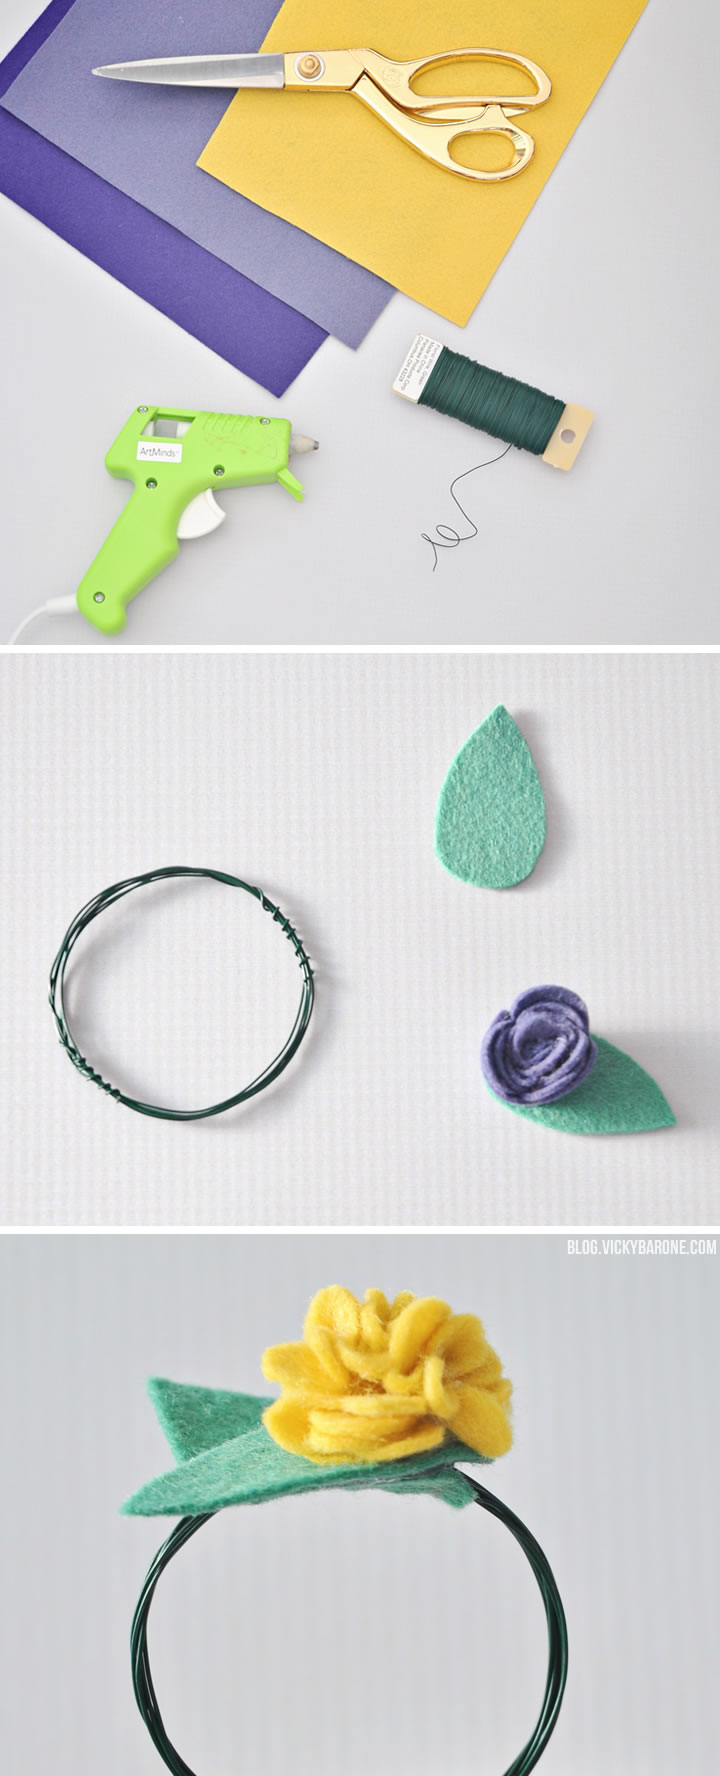 DIY Felt Flower Napkin Rings | Vicky Barone